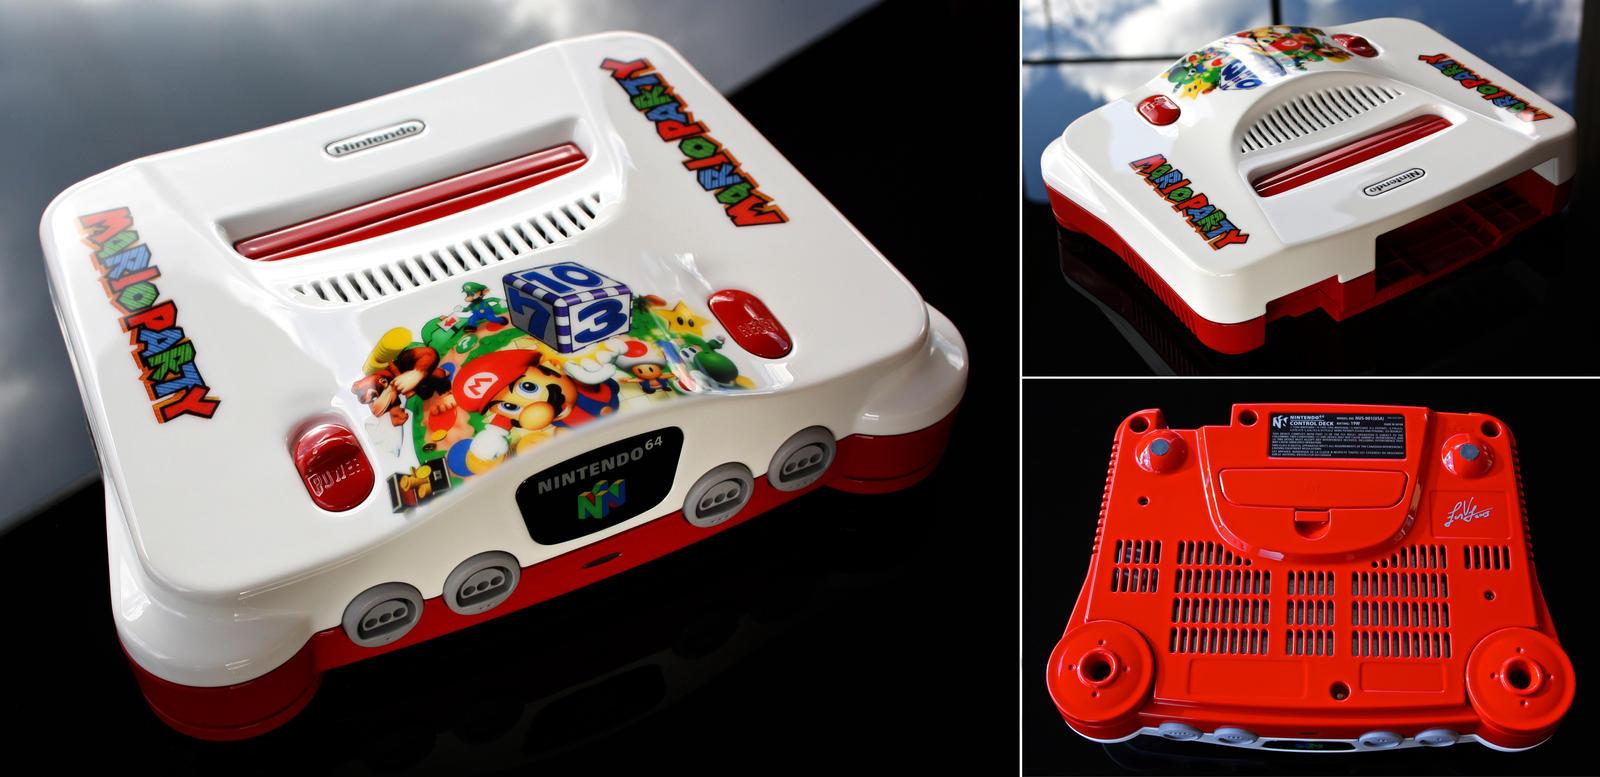 Custom mario party n64 console by zoki64 on deviantart - Super nintendo 64 console ...